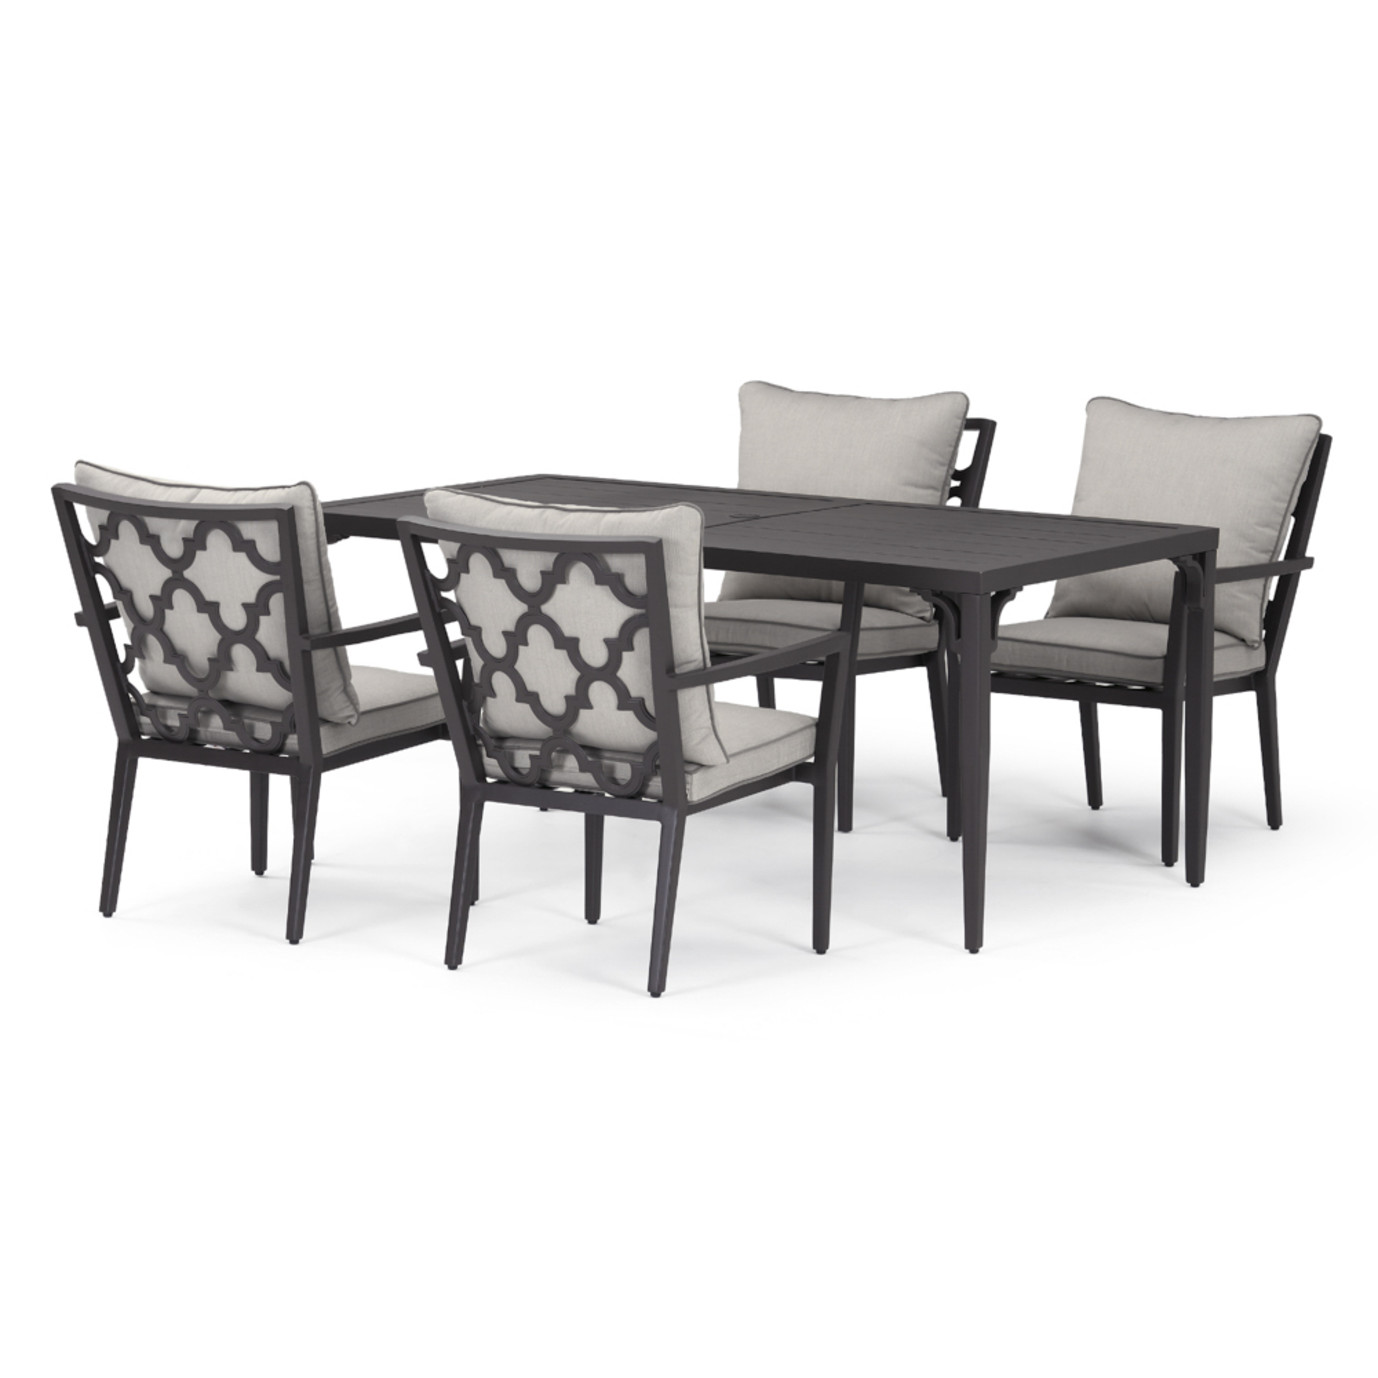 Venetia™ 5 Piece Dining Set